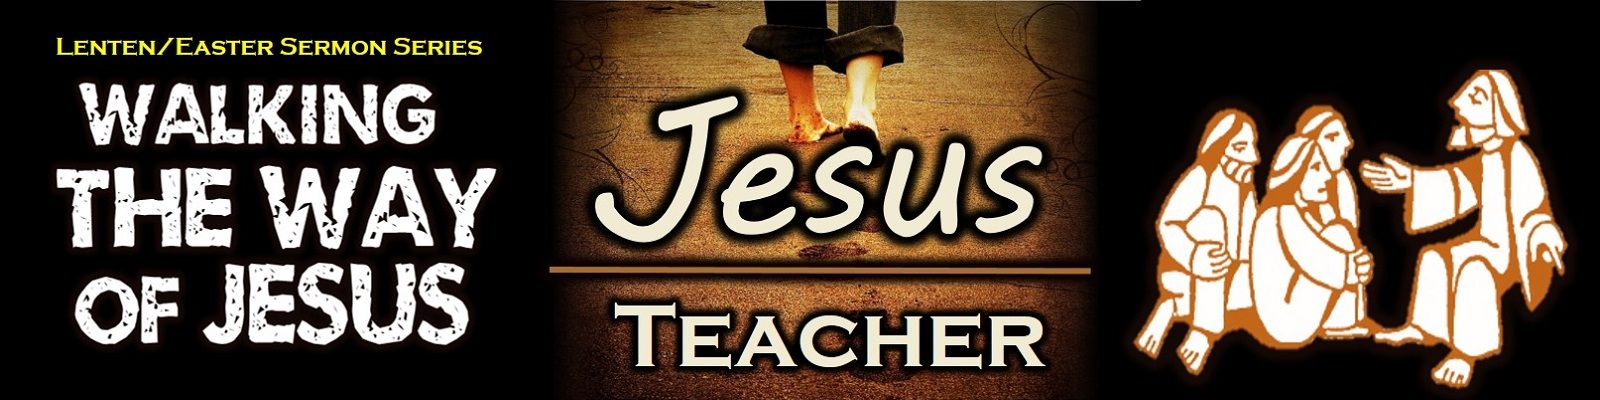 The Way Study #3 - Jesus teacher disrupter